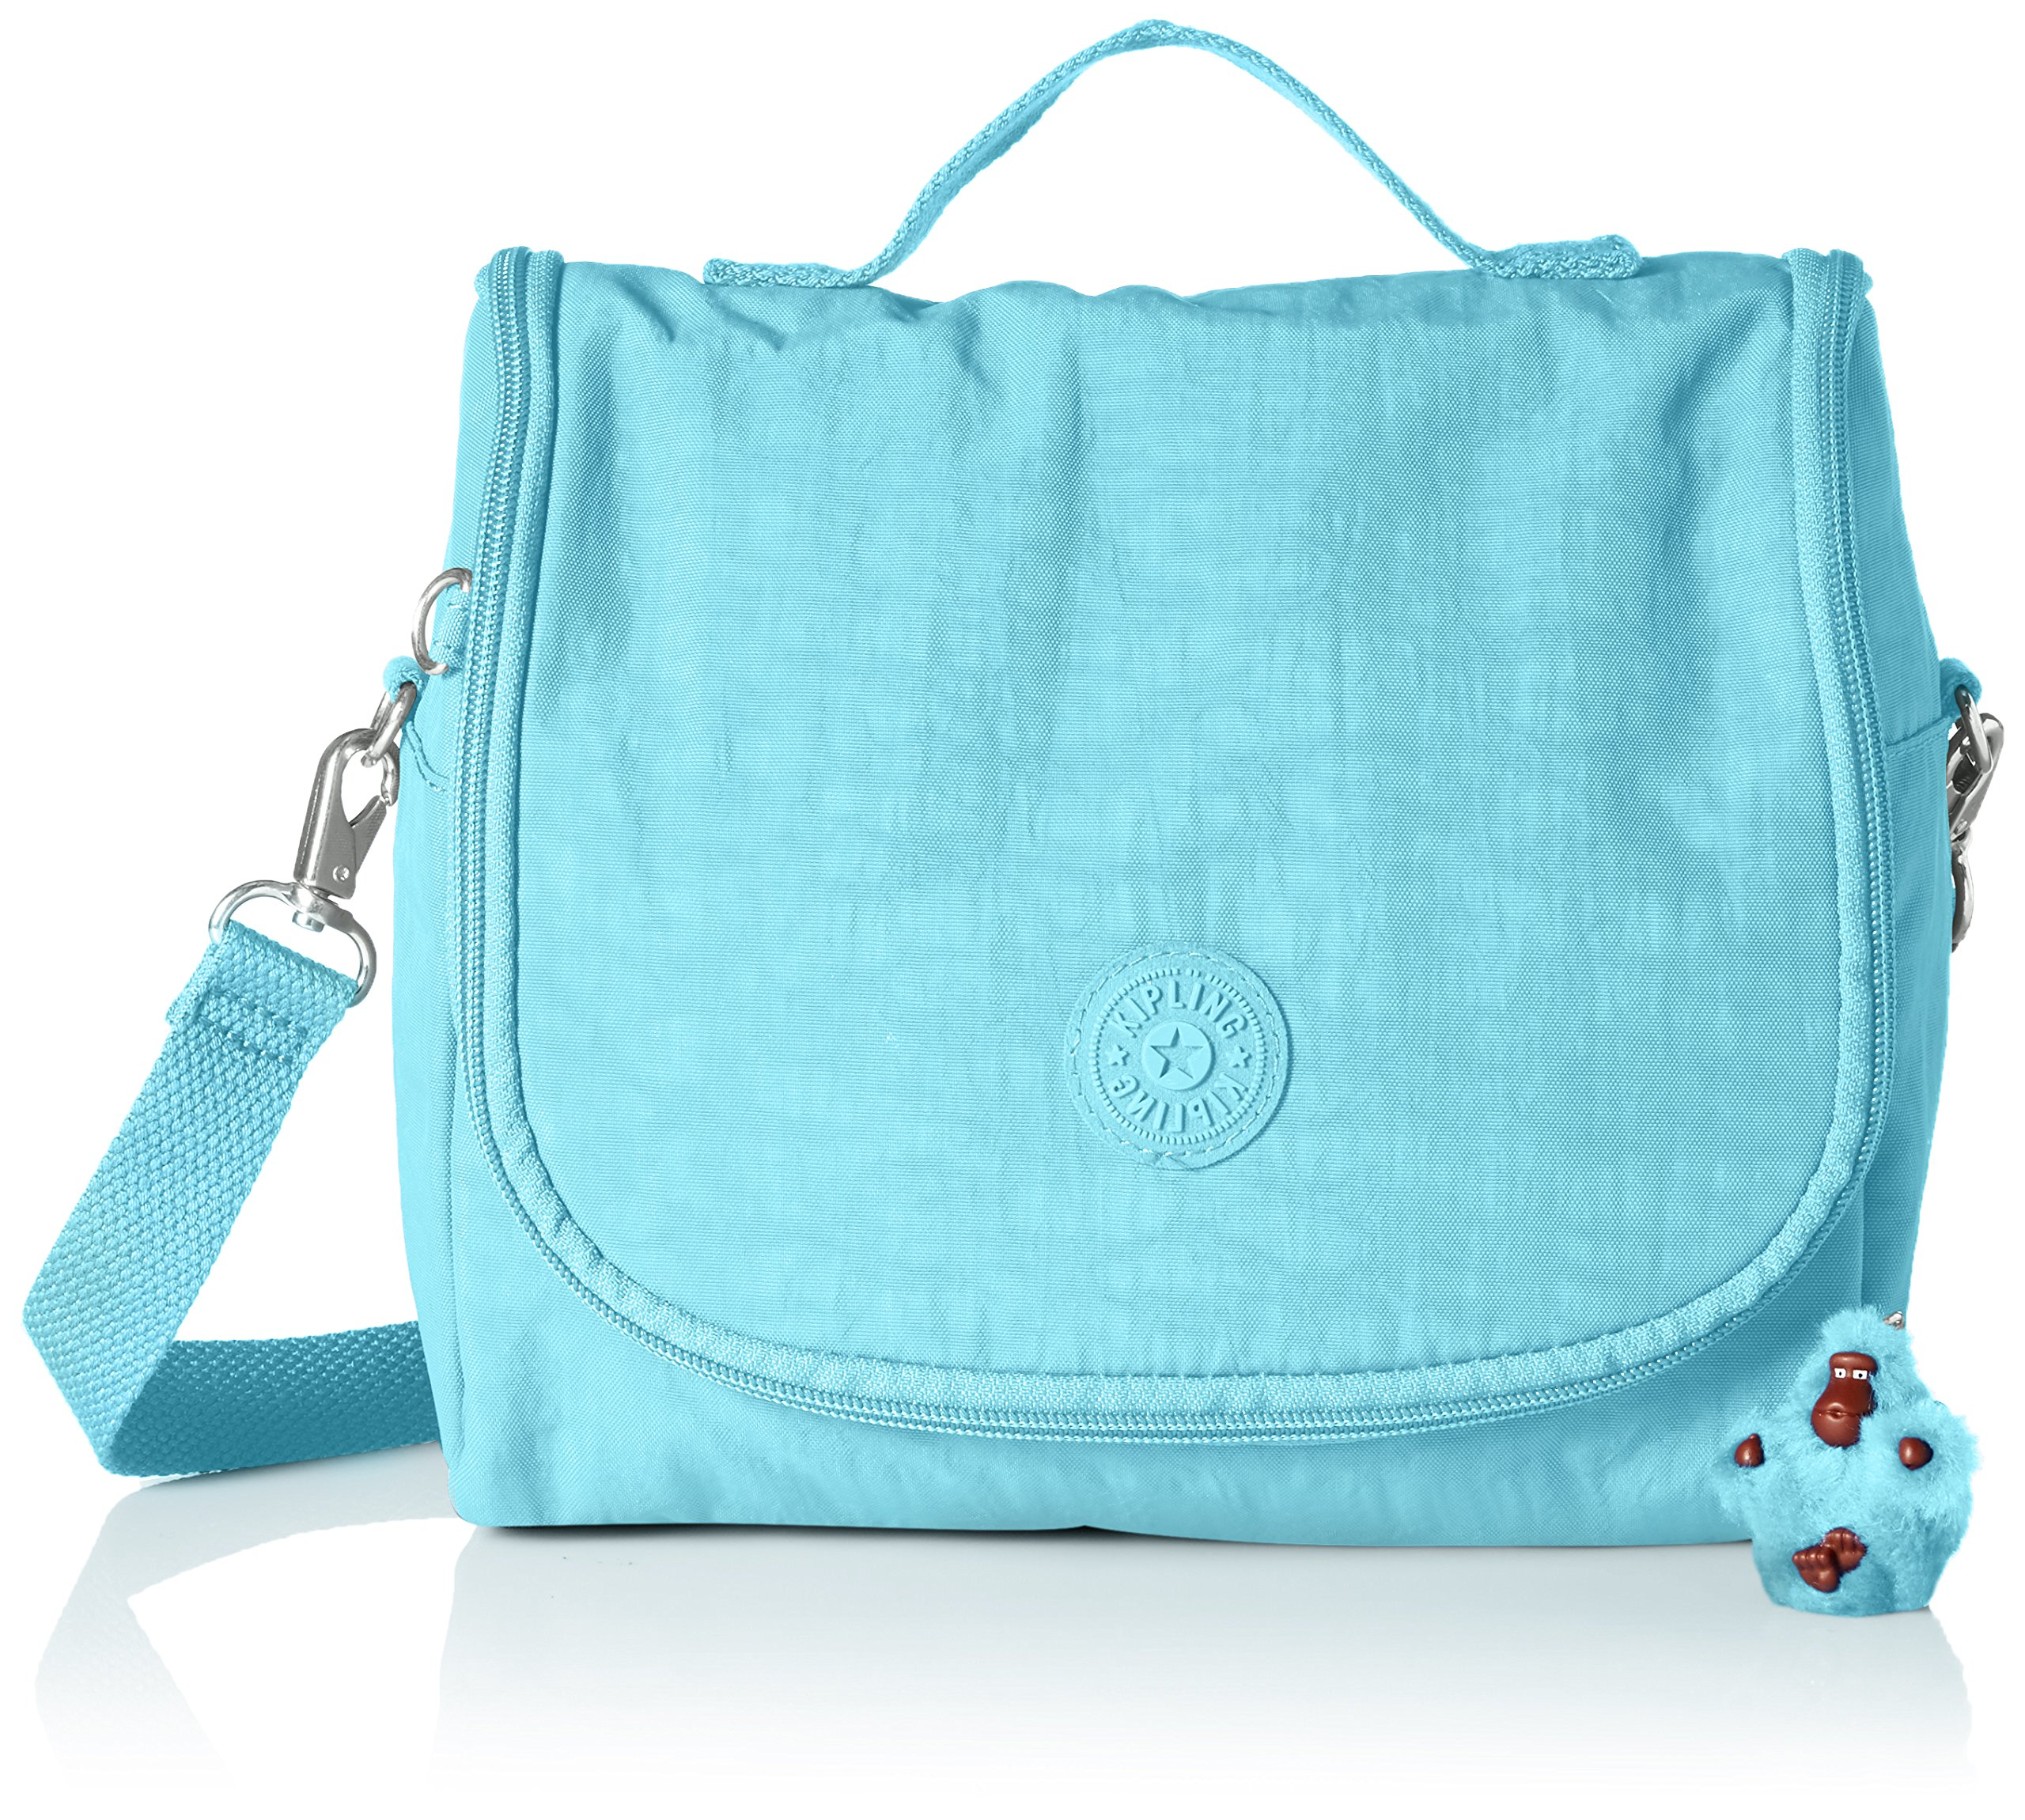 Kipling Kichirou Blue Splash Insulated Lunch Bag, Bluesplash